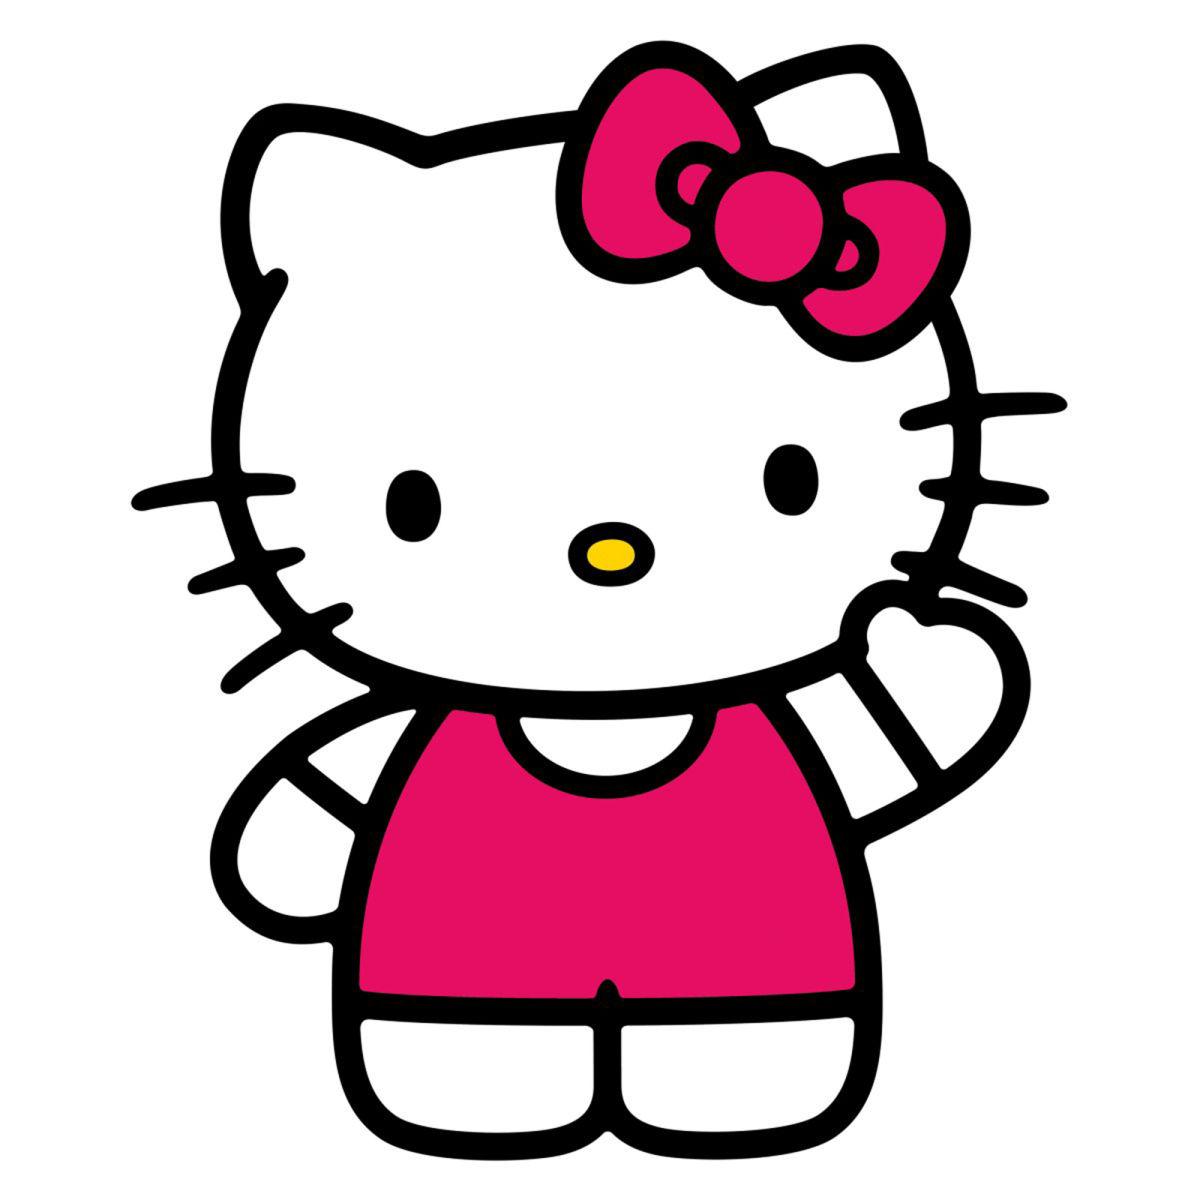 Gambar Kartun Hello Kitty Yang Mudah Digambar Terbaru